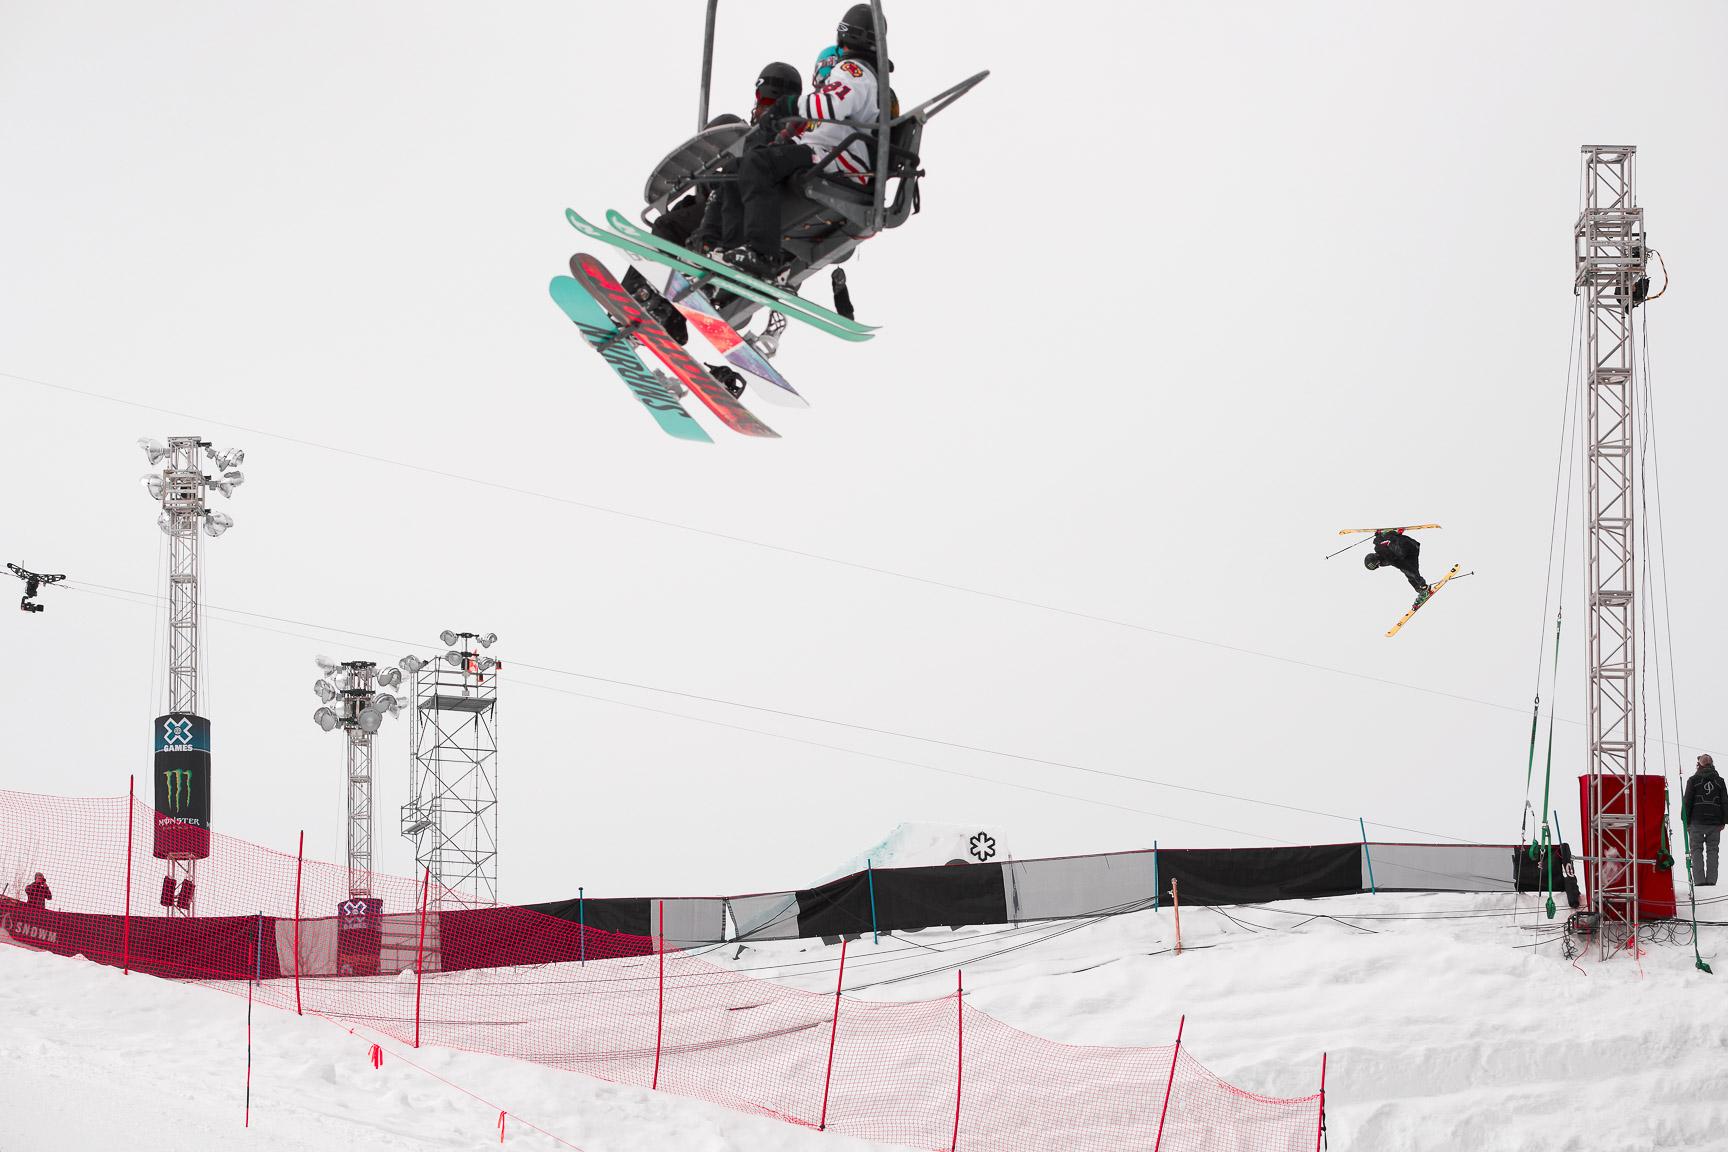 Alex Beaulieu-Marchand, Men's Ski Slopestyle